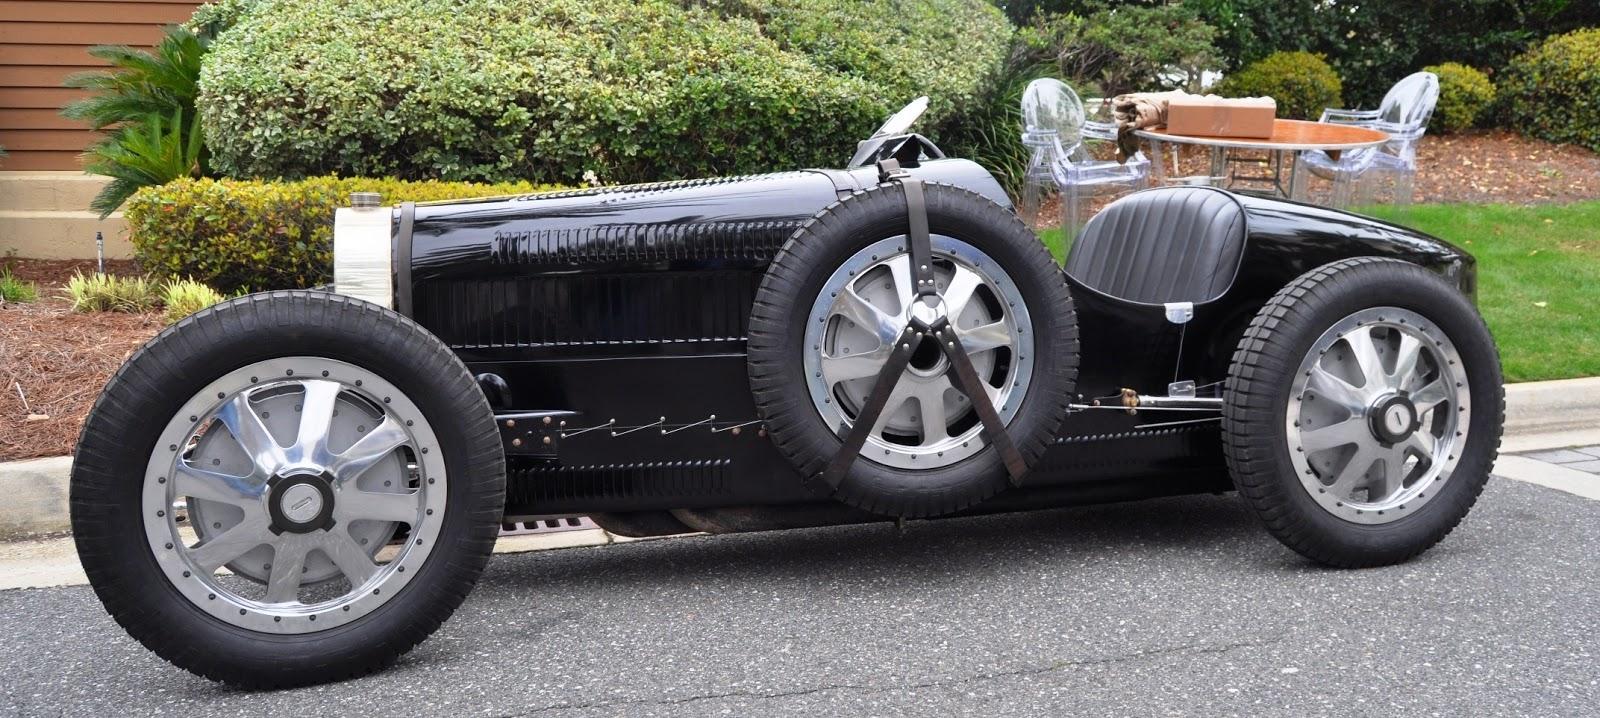 Keith Urban Bugatti